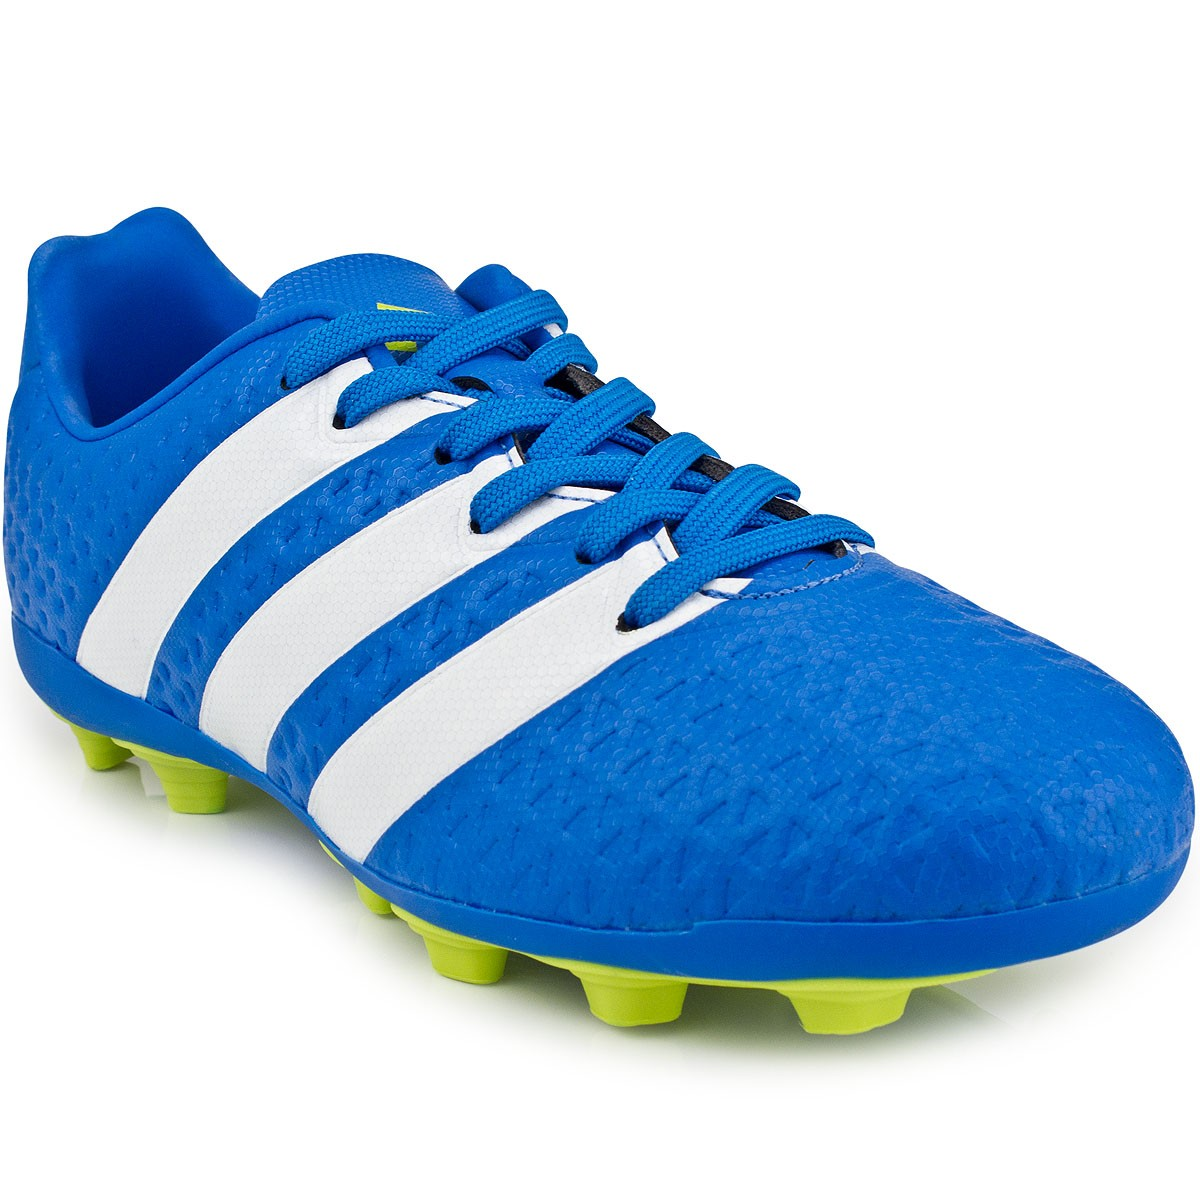 Chuteira Adidas Ace 16.4 FXG Jr  2a8b618db7531